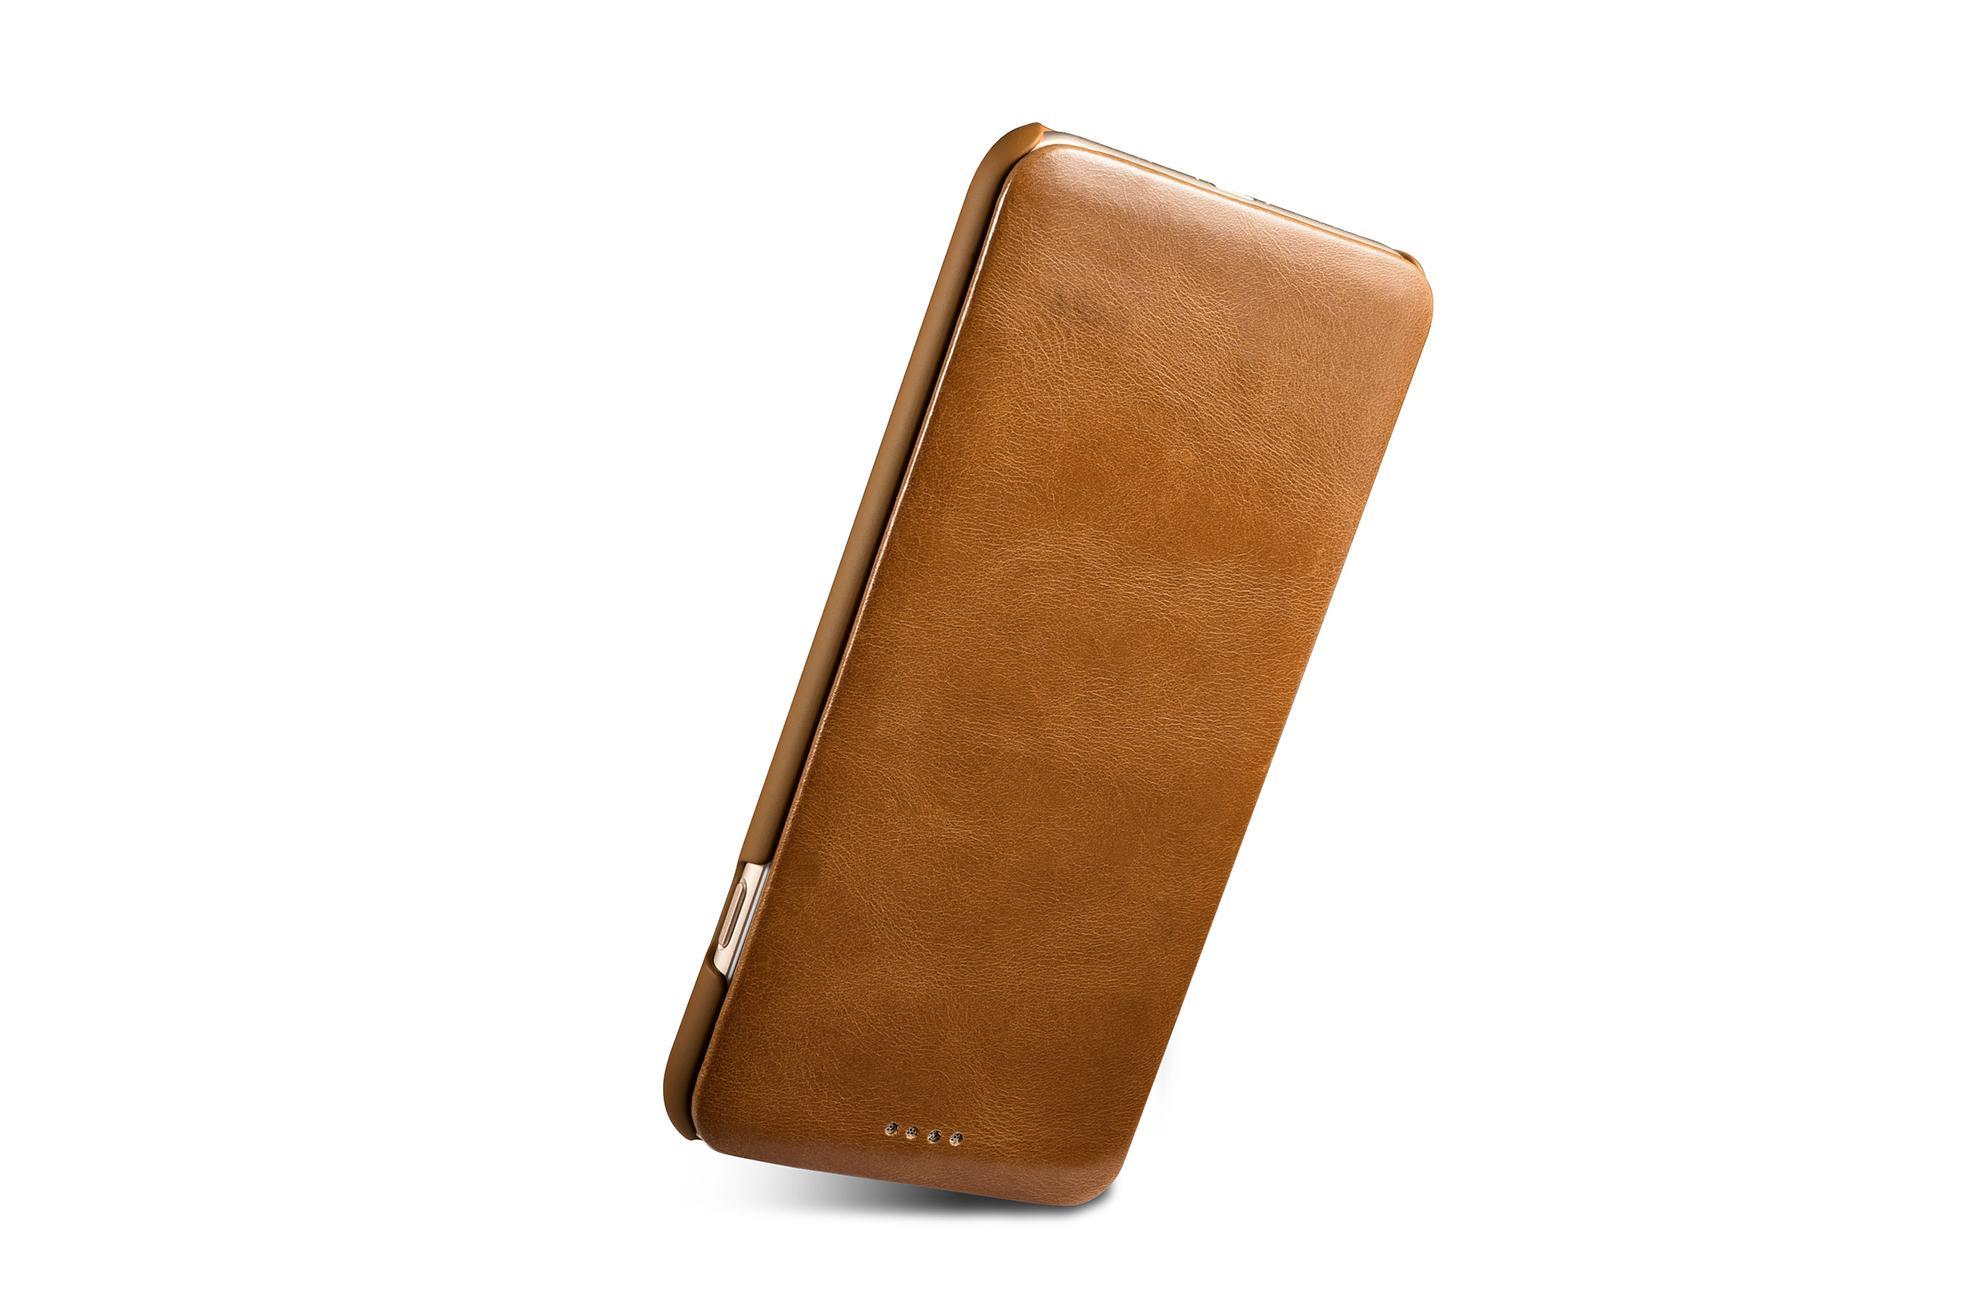 Xoomz iPhone 7 Silmarillion Leather Side Open Case 3